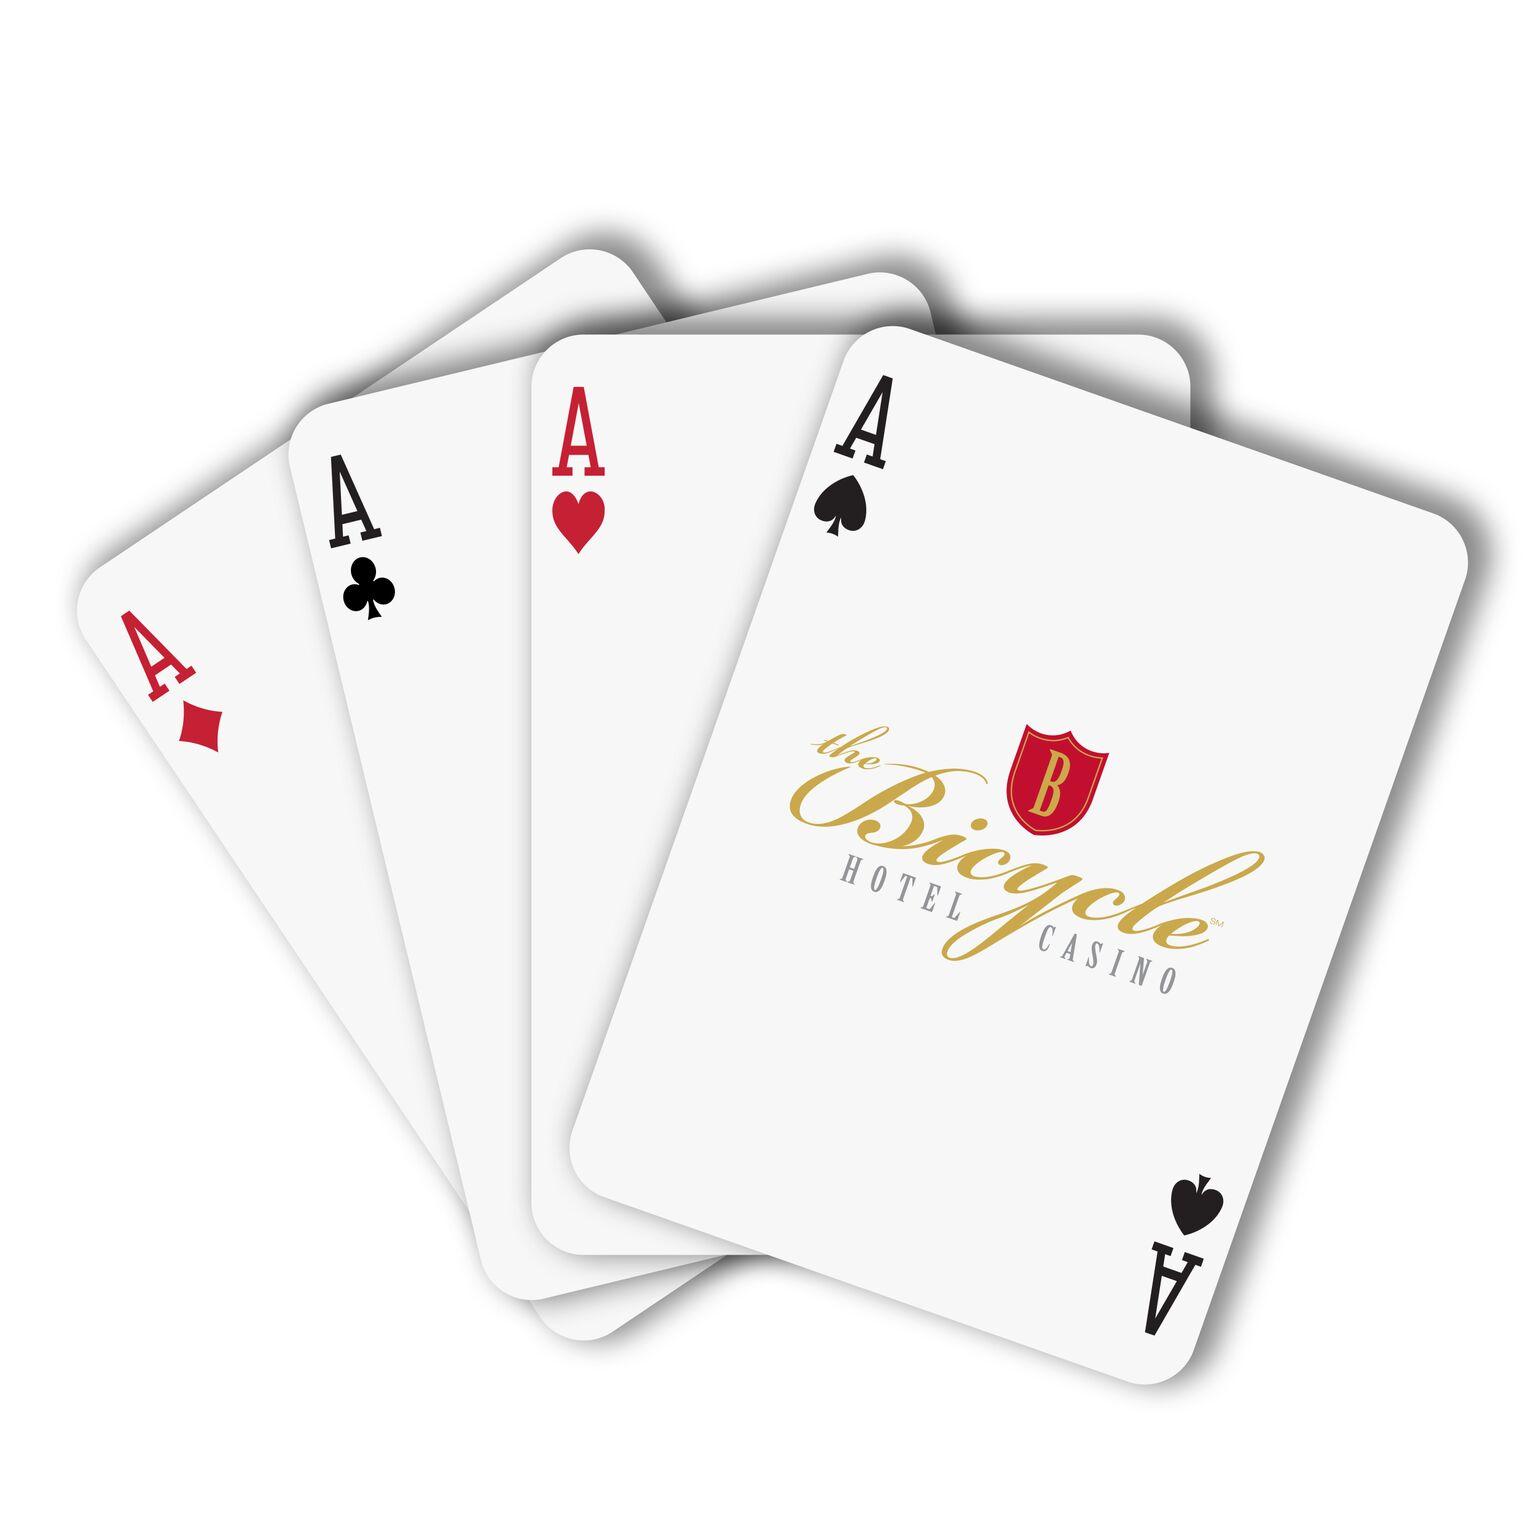 https://www.appdocs.com/applicantpro/files/poker1.jpeg